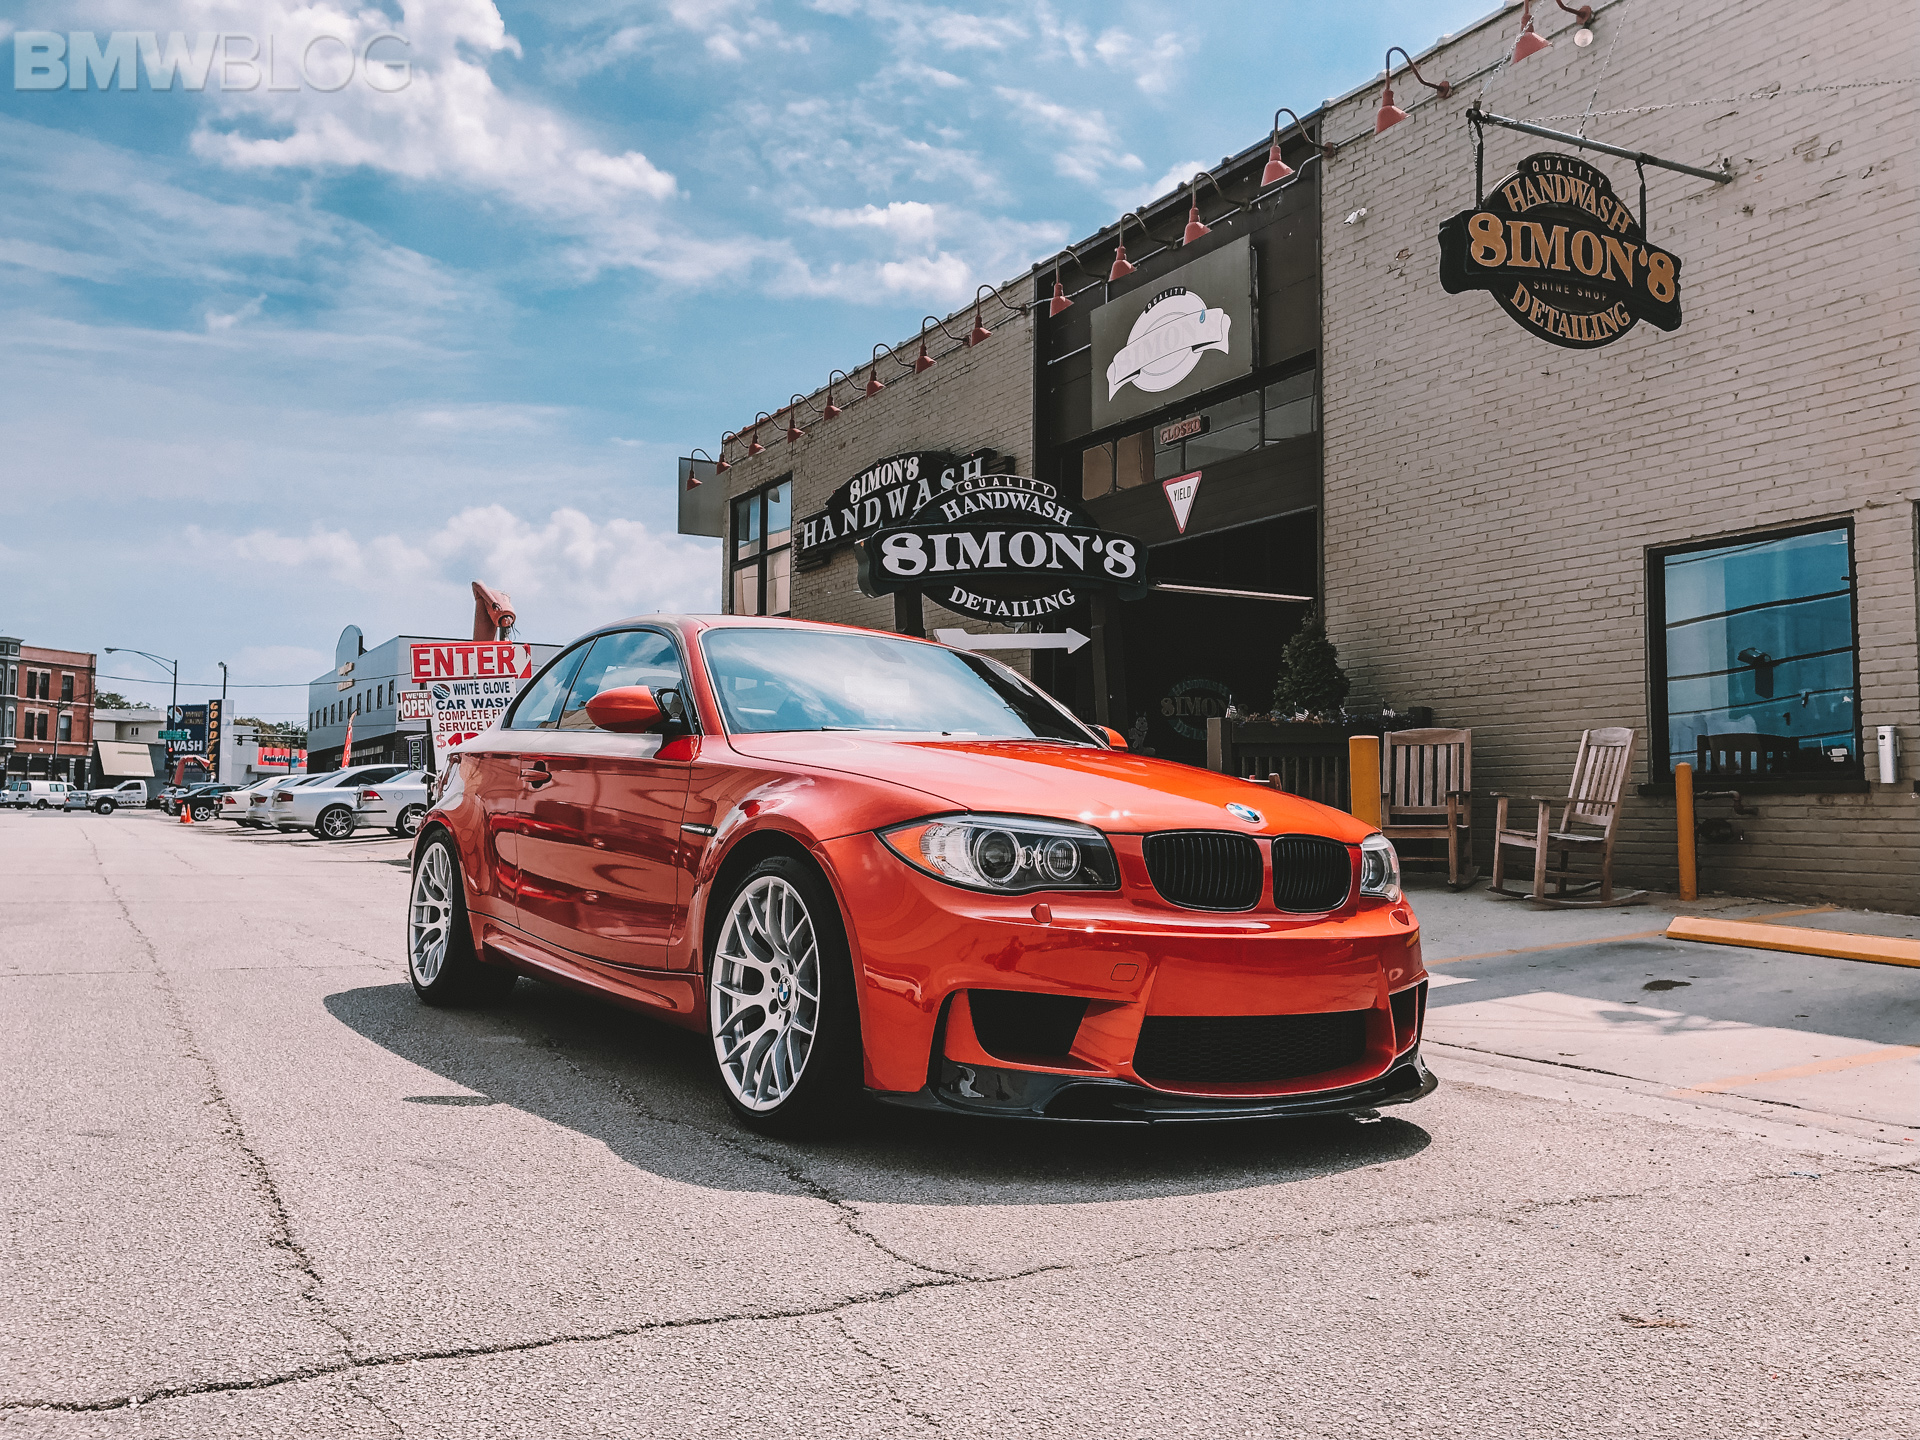 BMW 1M BMWBLOG 1